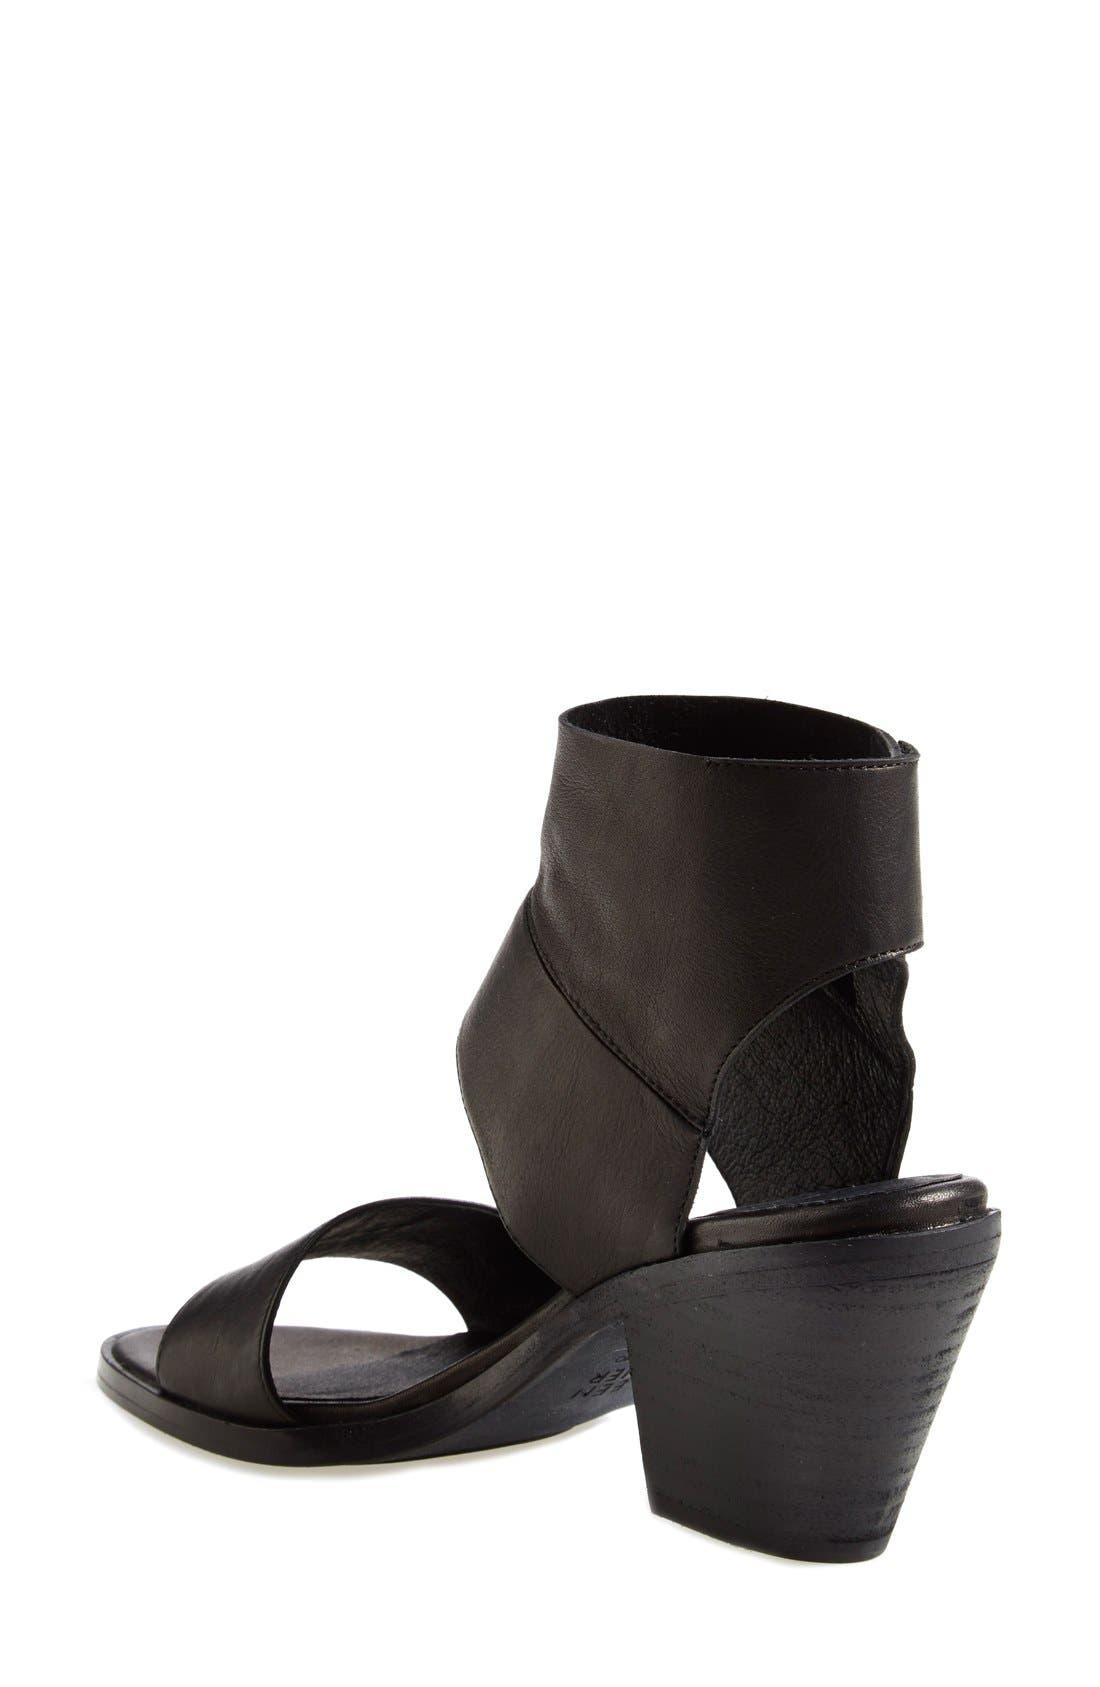 'Art' Tumbled Leather Ankle Cuff Sandal,                             Alternate thumbnail 2, color,                             Black